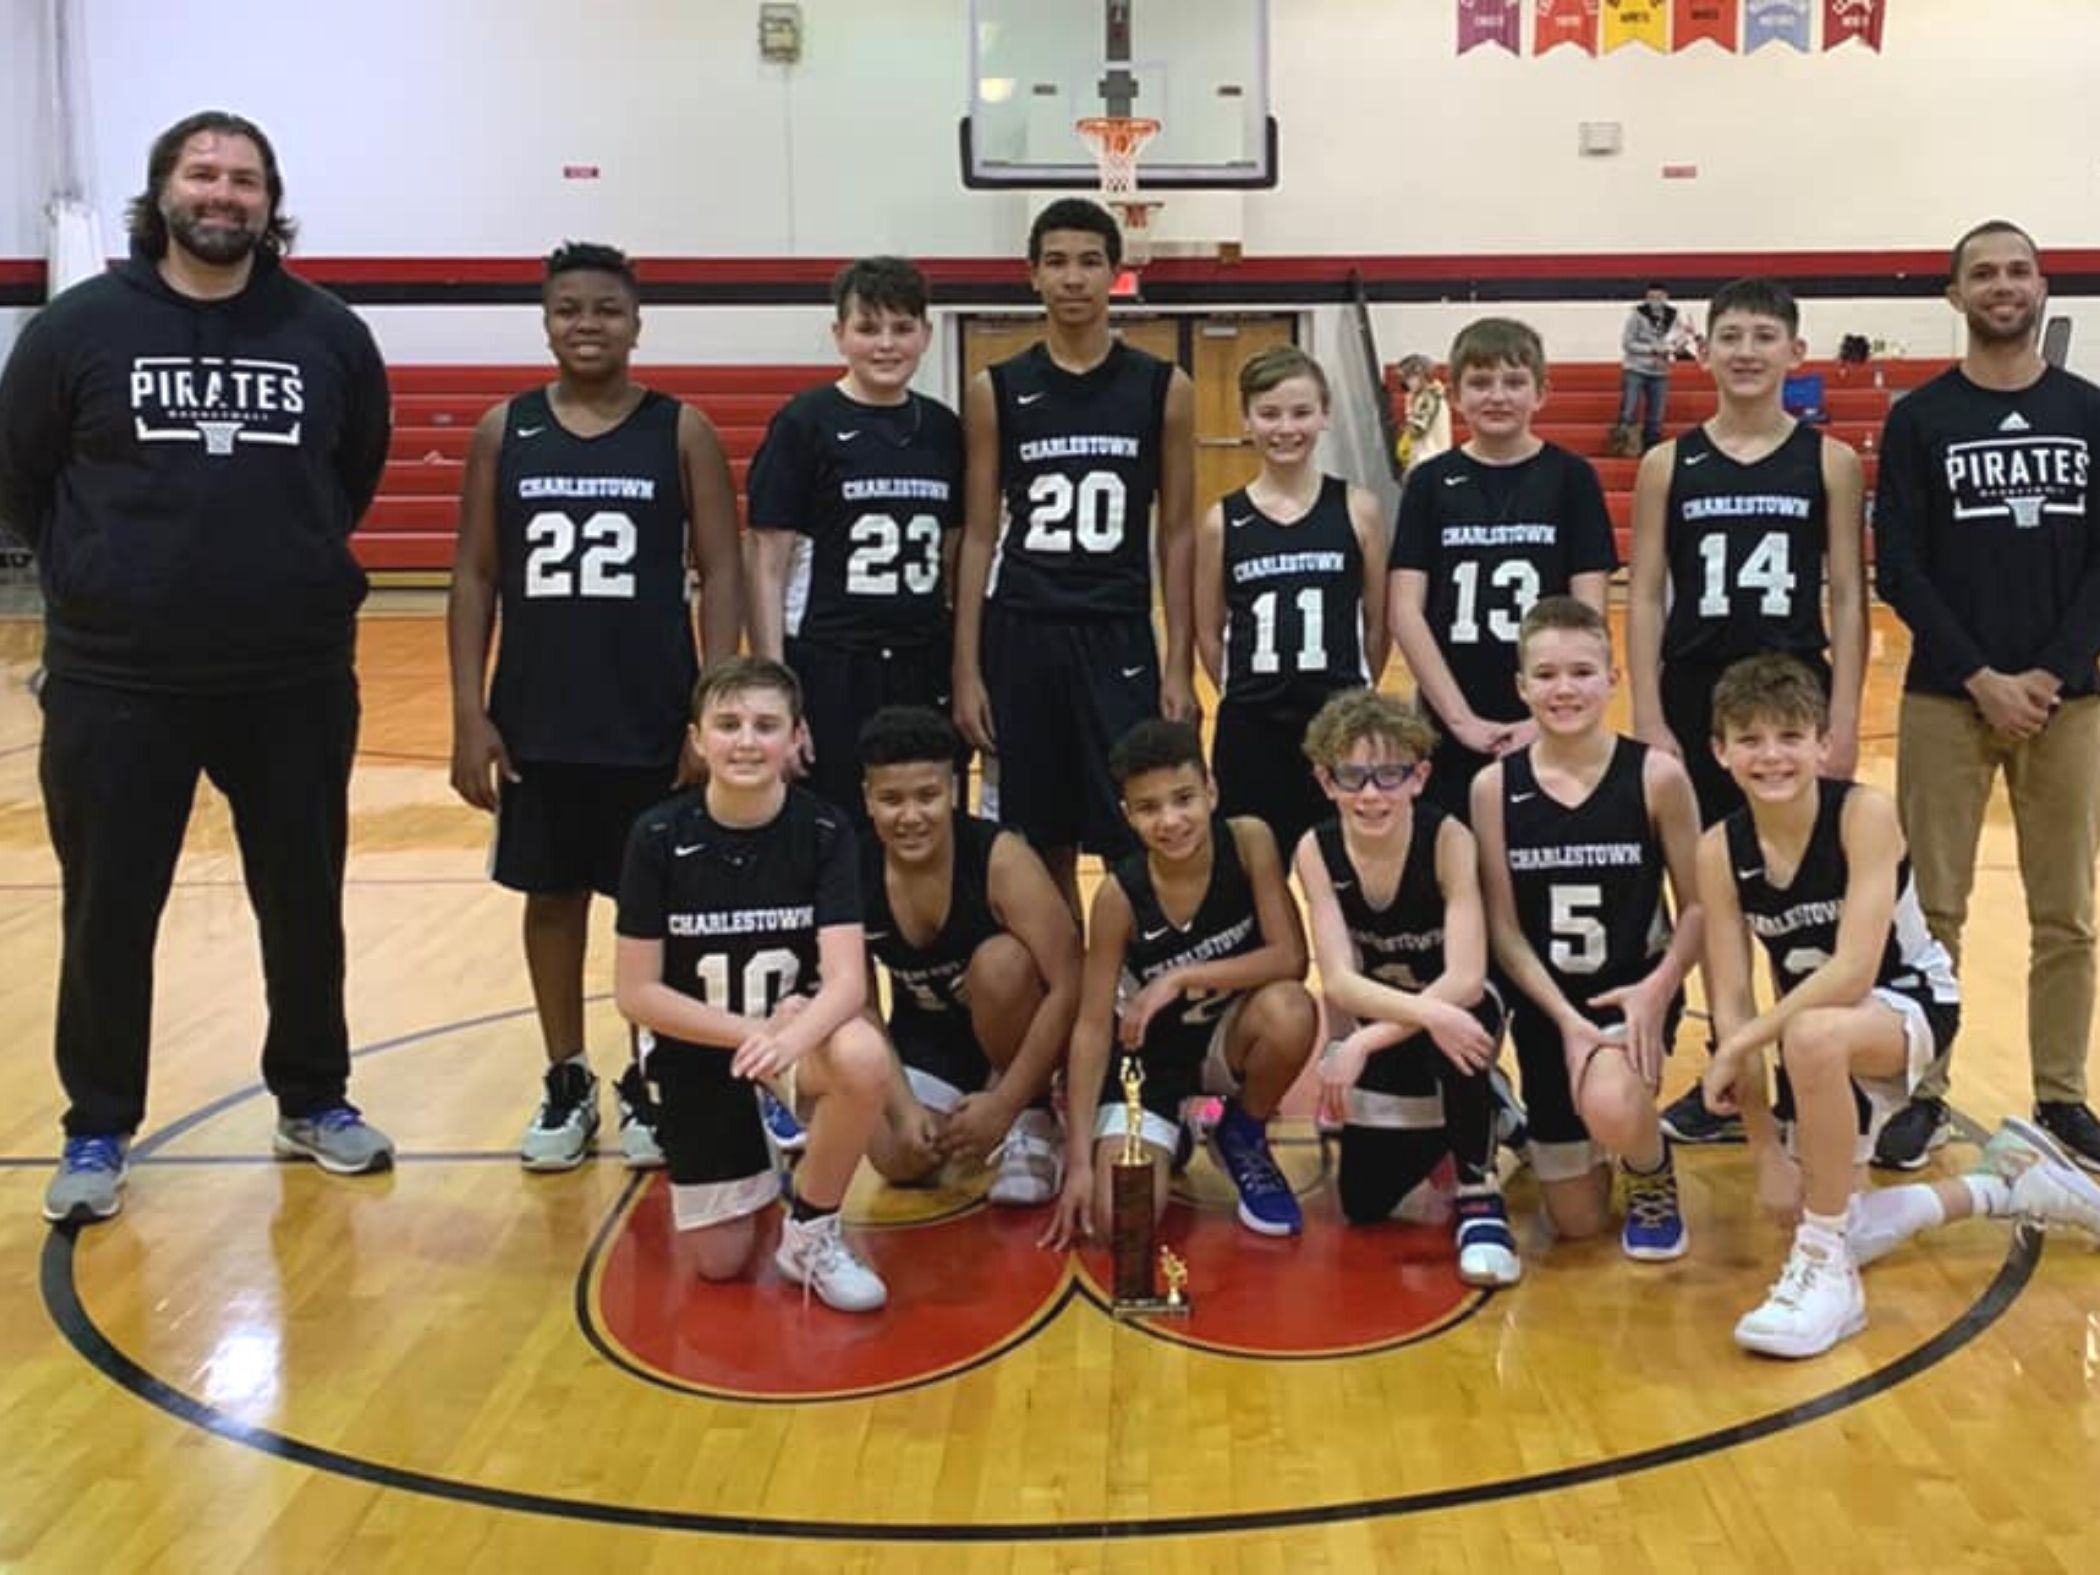 Boys basketball team posing together